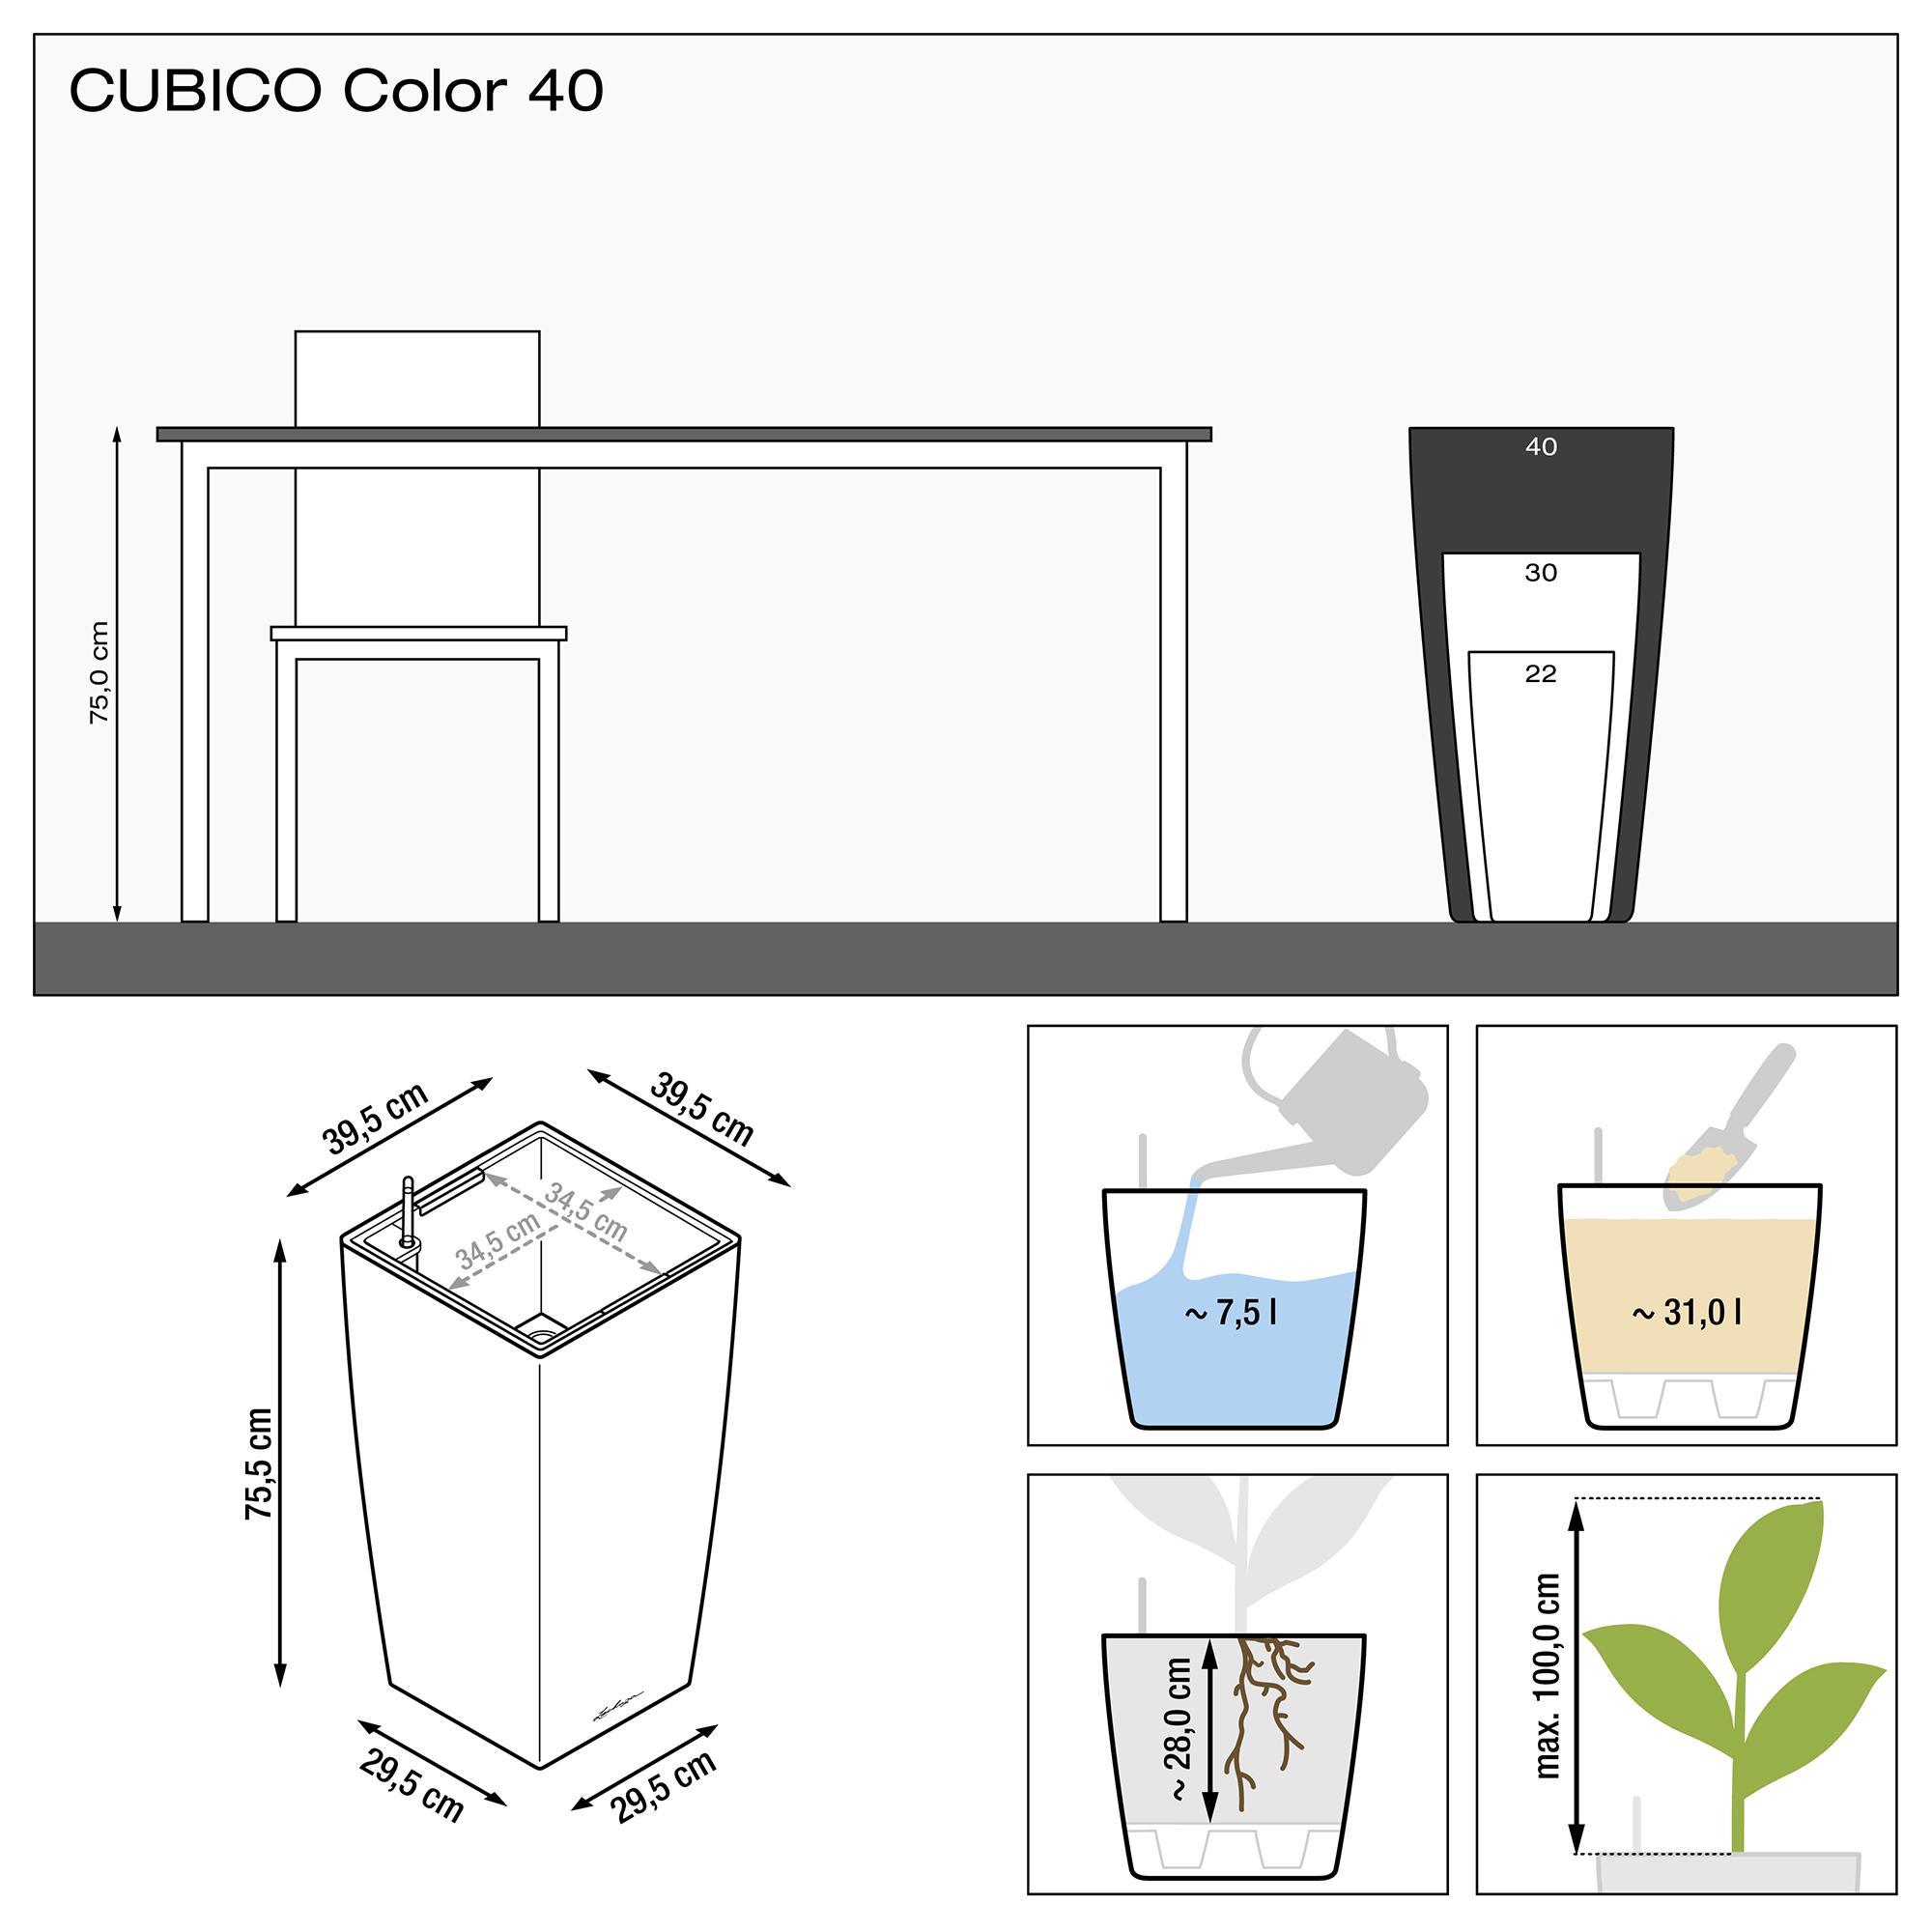 CUBICO Color 40 muskaat - Image 3